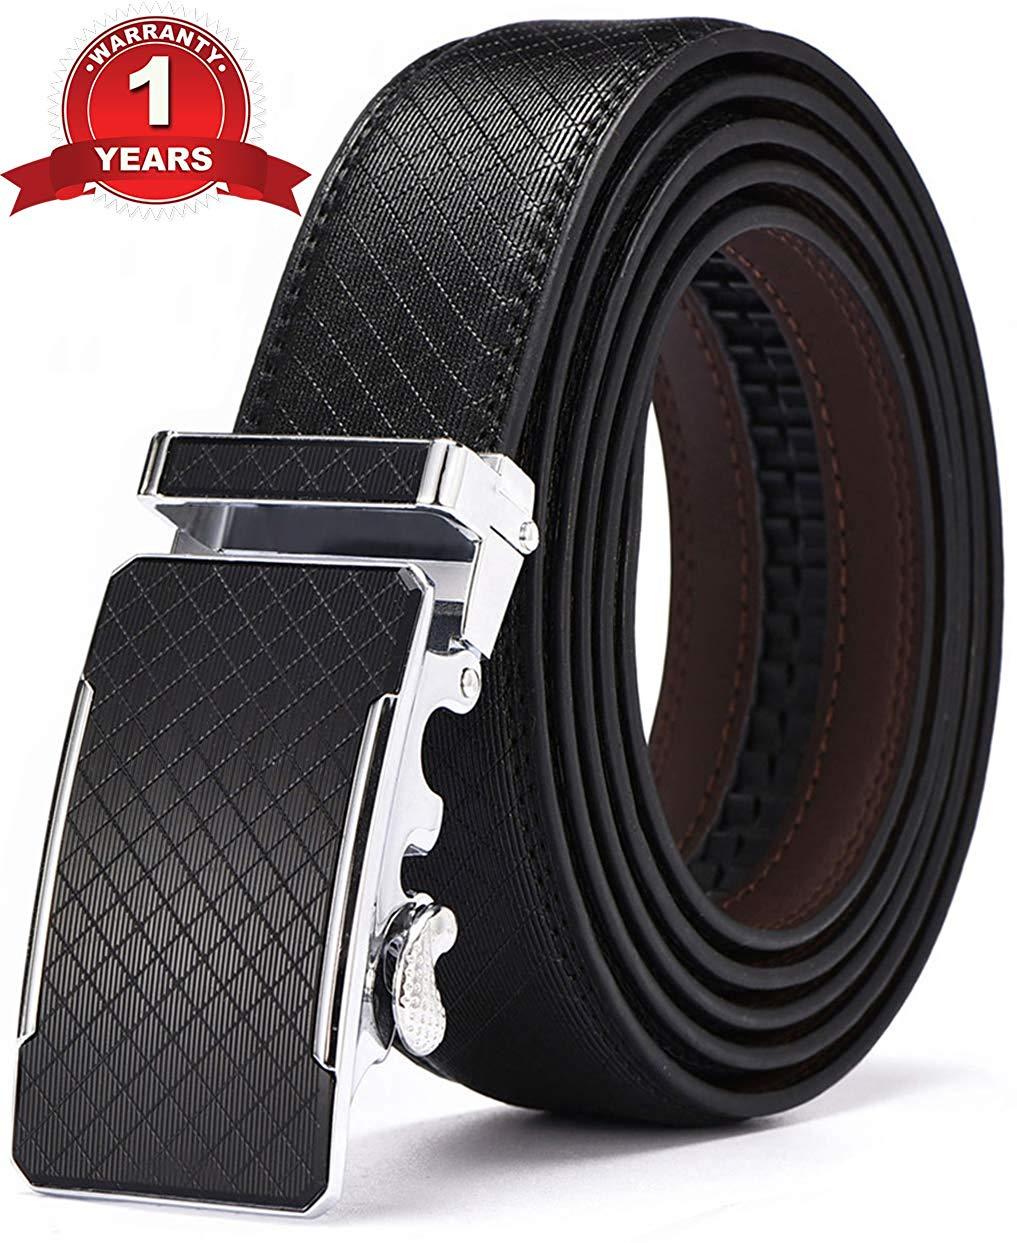 Men/'s Genuine Leather Ratchet Automatic Dress Belt By Greach Man Black